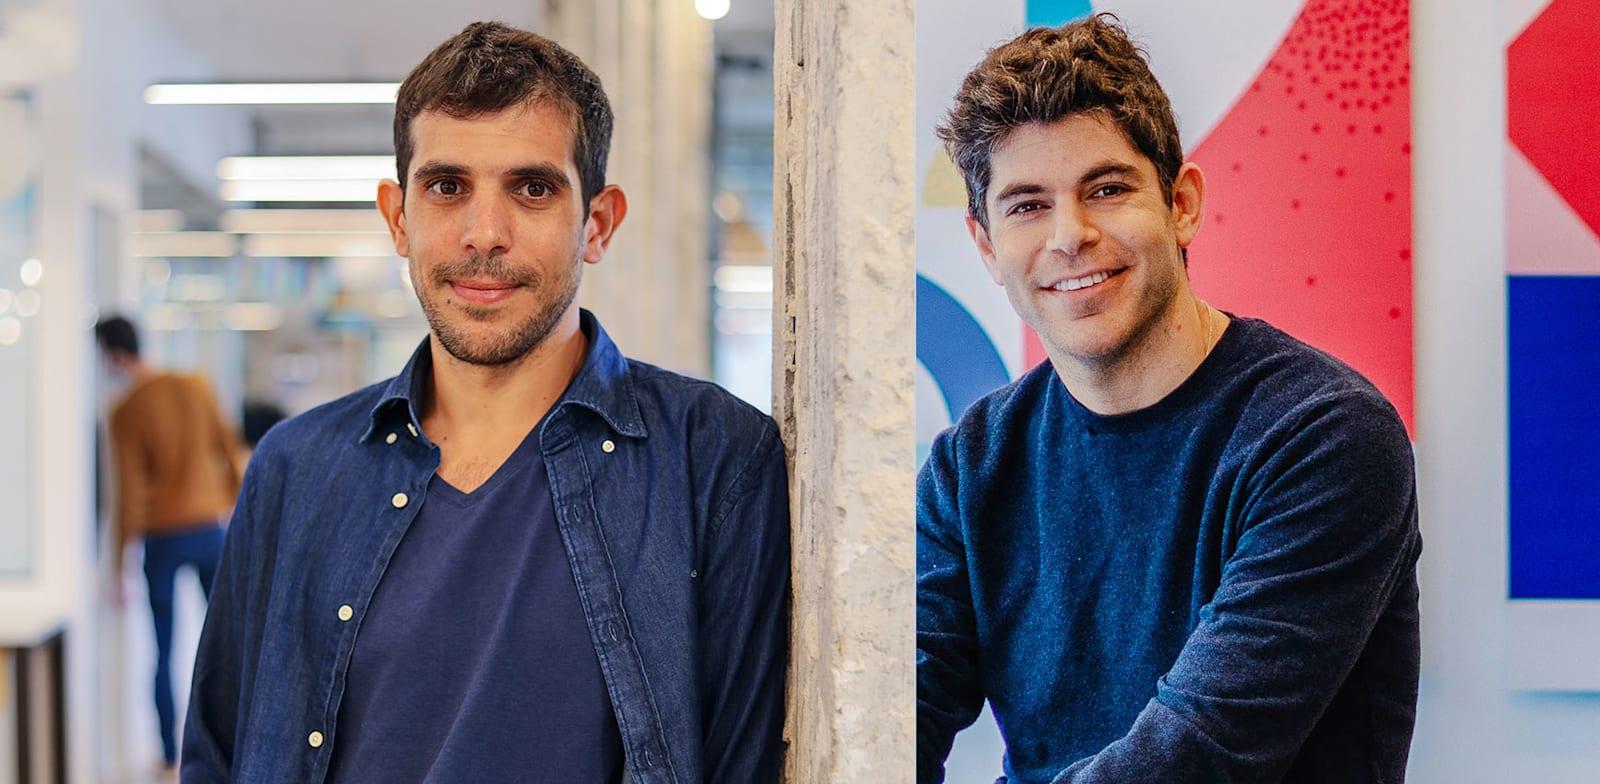 Omri Cohen and Tomer Tagrin. Credit: Mor Shani